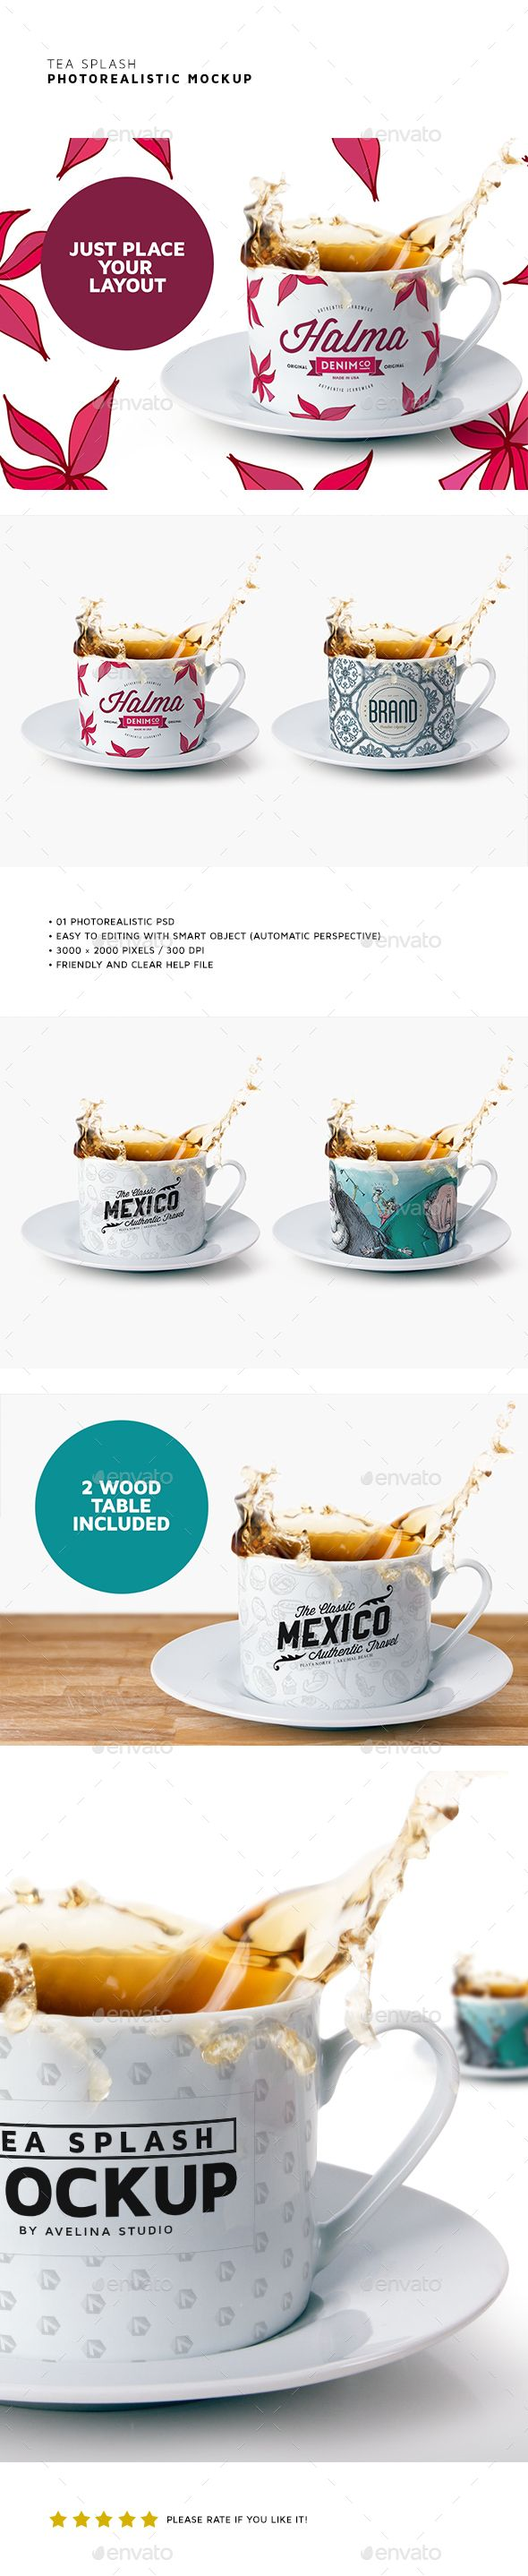 Tea Splash Mockup #design Download: http://graphicriver.net/item/tea-splash-mockup/13308533?ref=ksioks